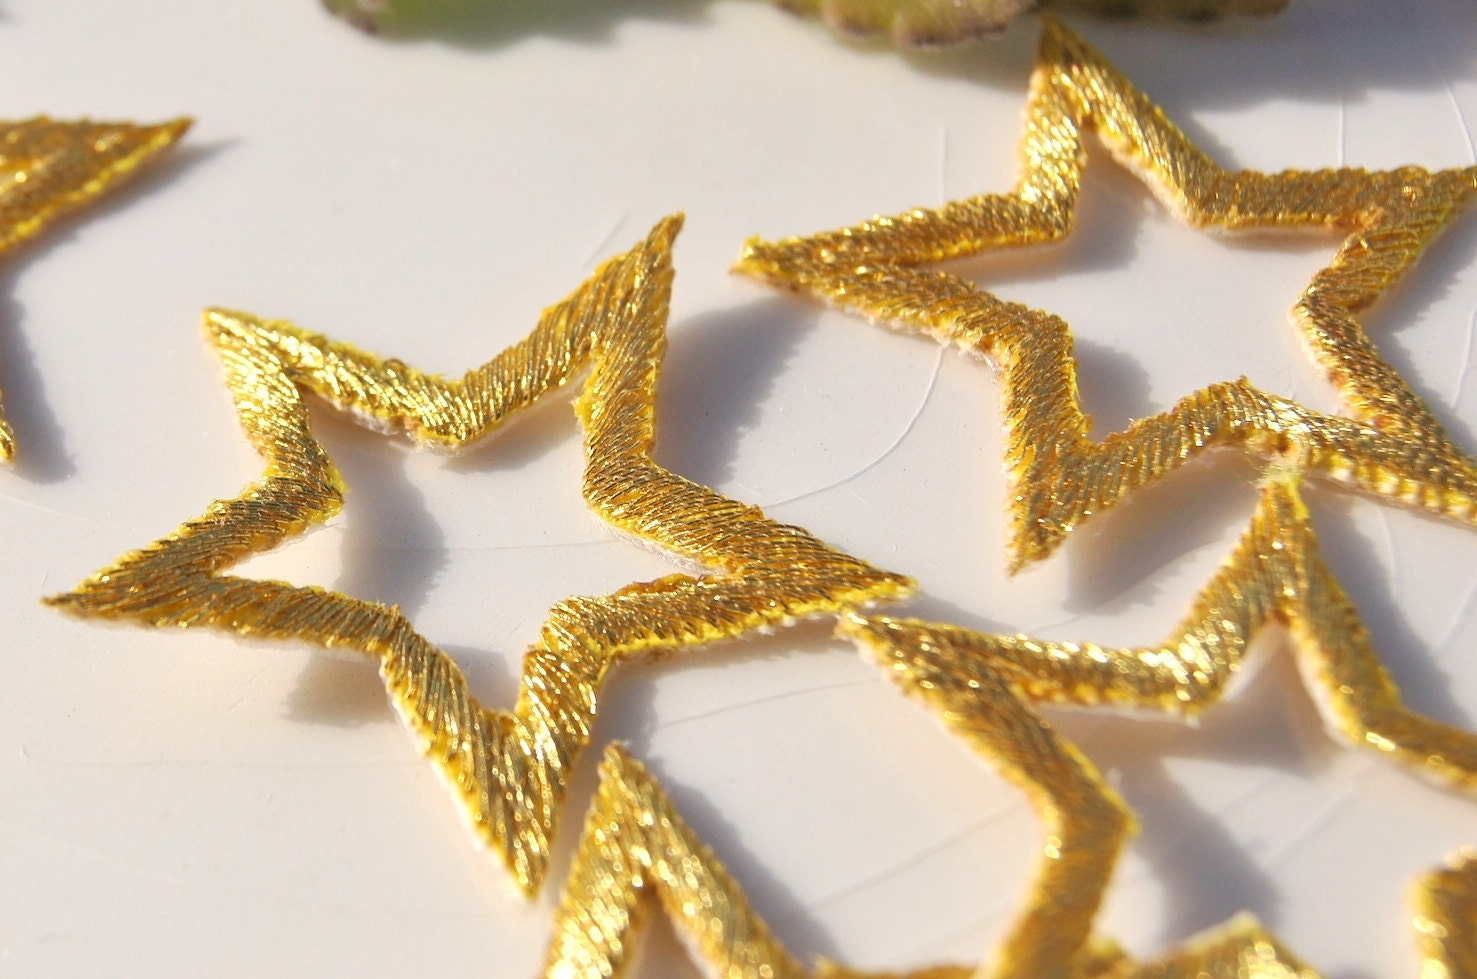 Metallic gold star applique vintage embroidered